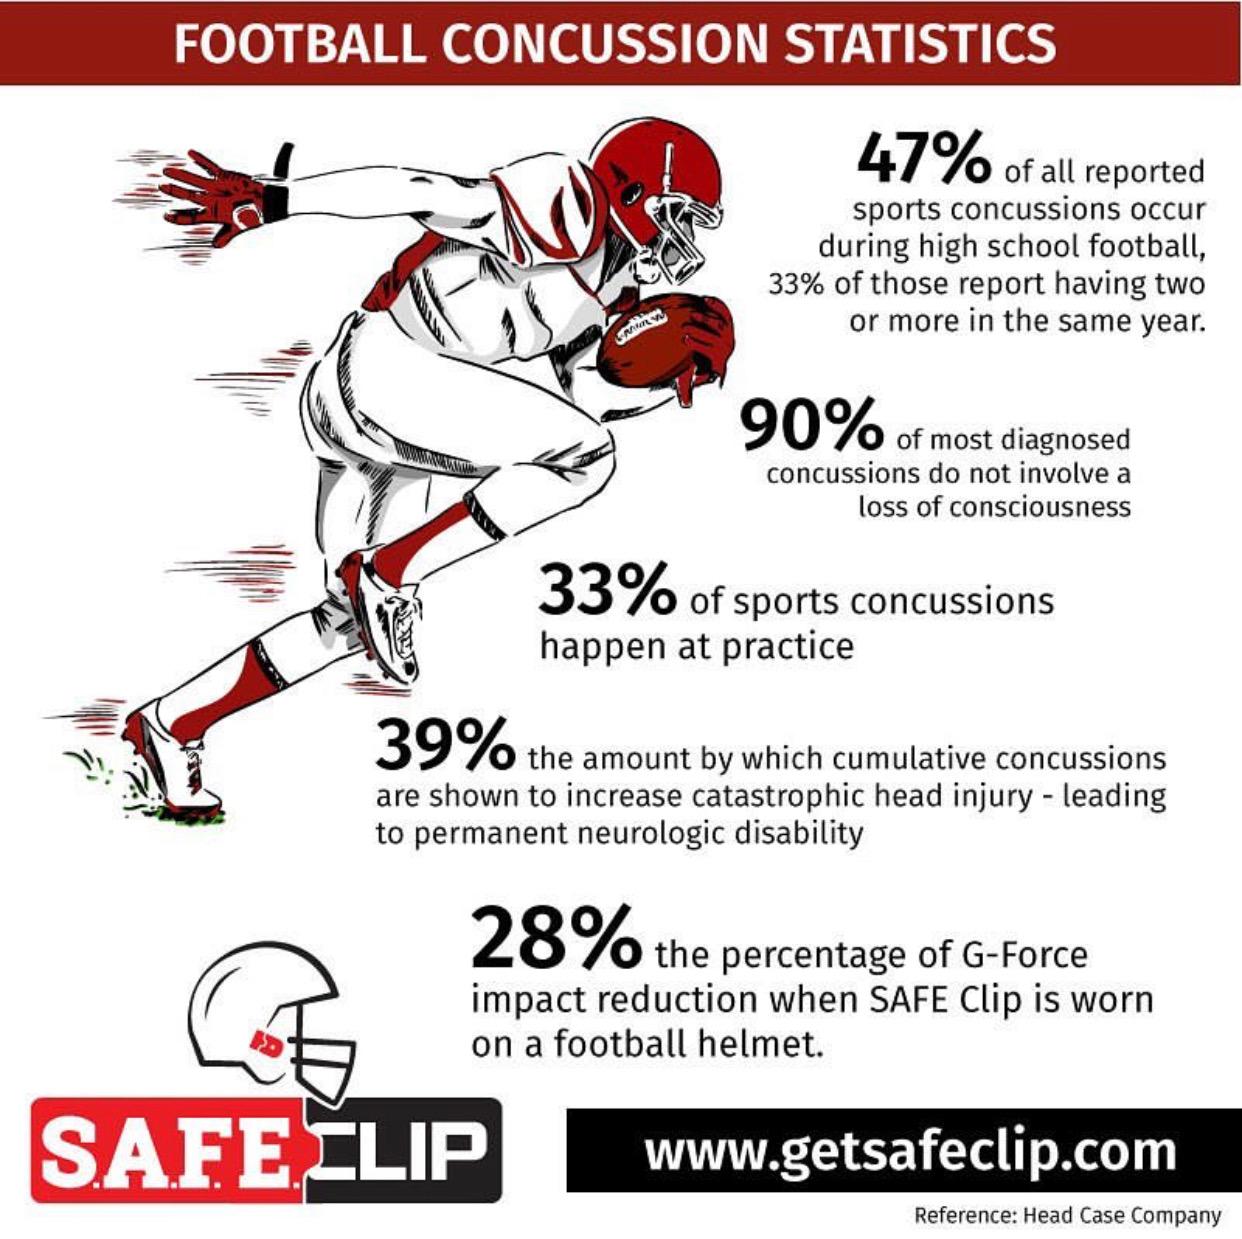 SAFEClip Infographic